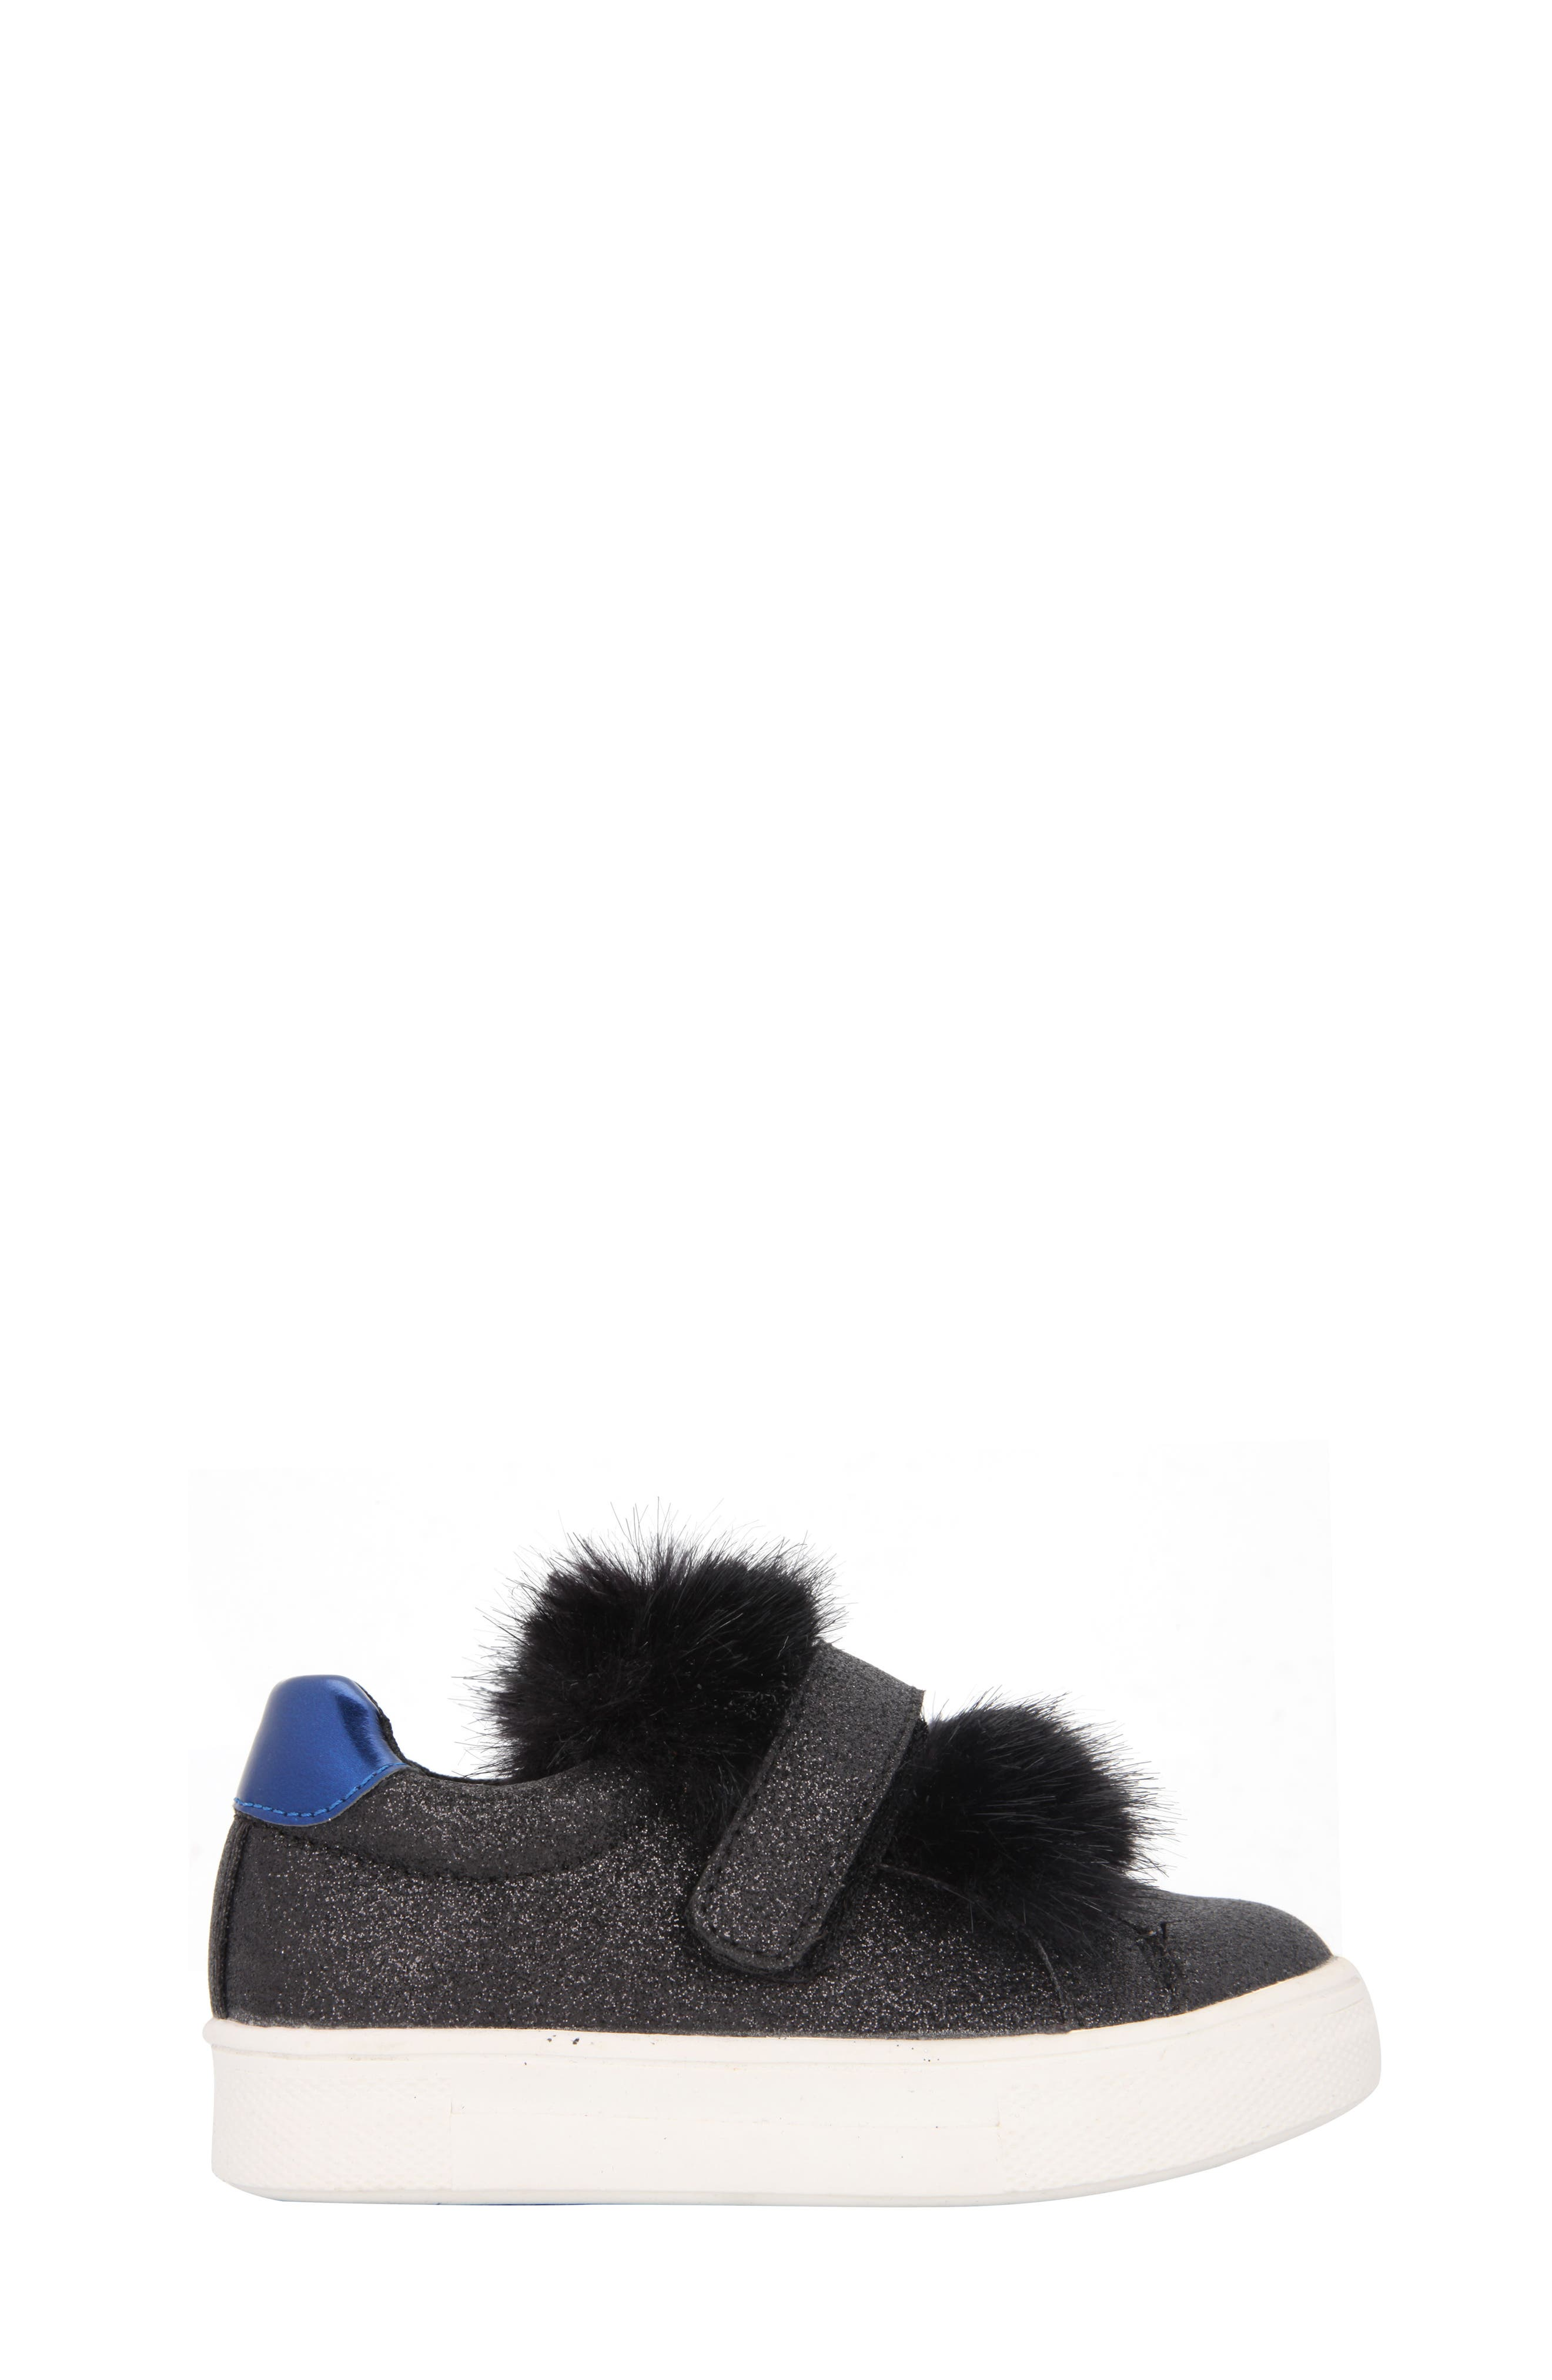 Alternate Image 3  - Nina Sunshine Glittery Faux Fur Sneaker (Walker, Toddler, Little Kid & Big Kid)